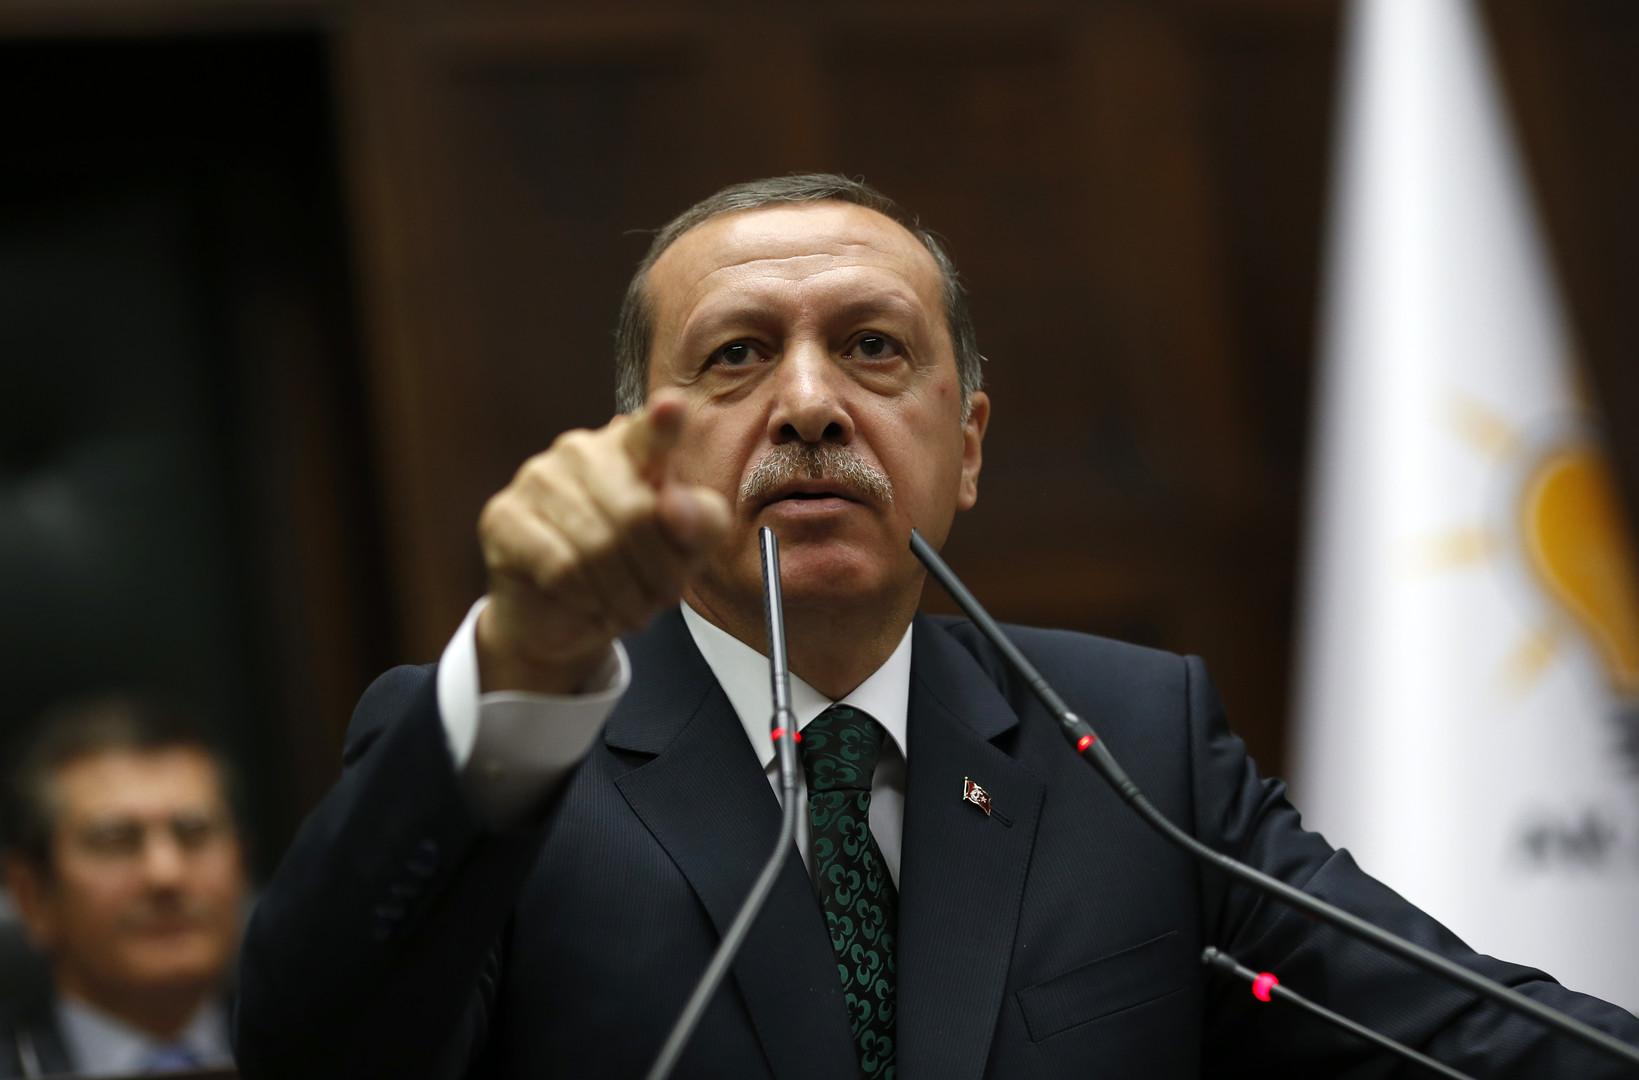 Эрдоган усомнился в турецких корнях автора резолюции бундестага о геноциде армян